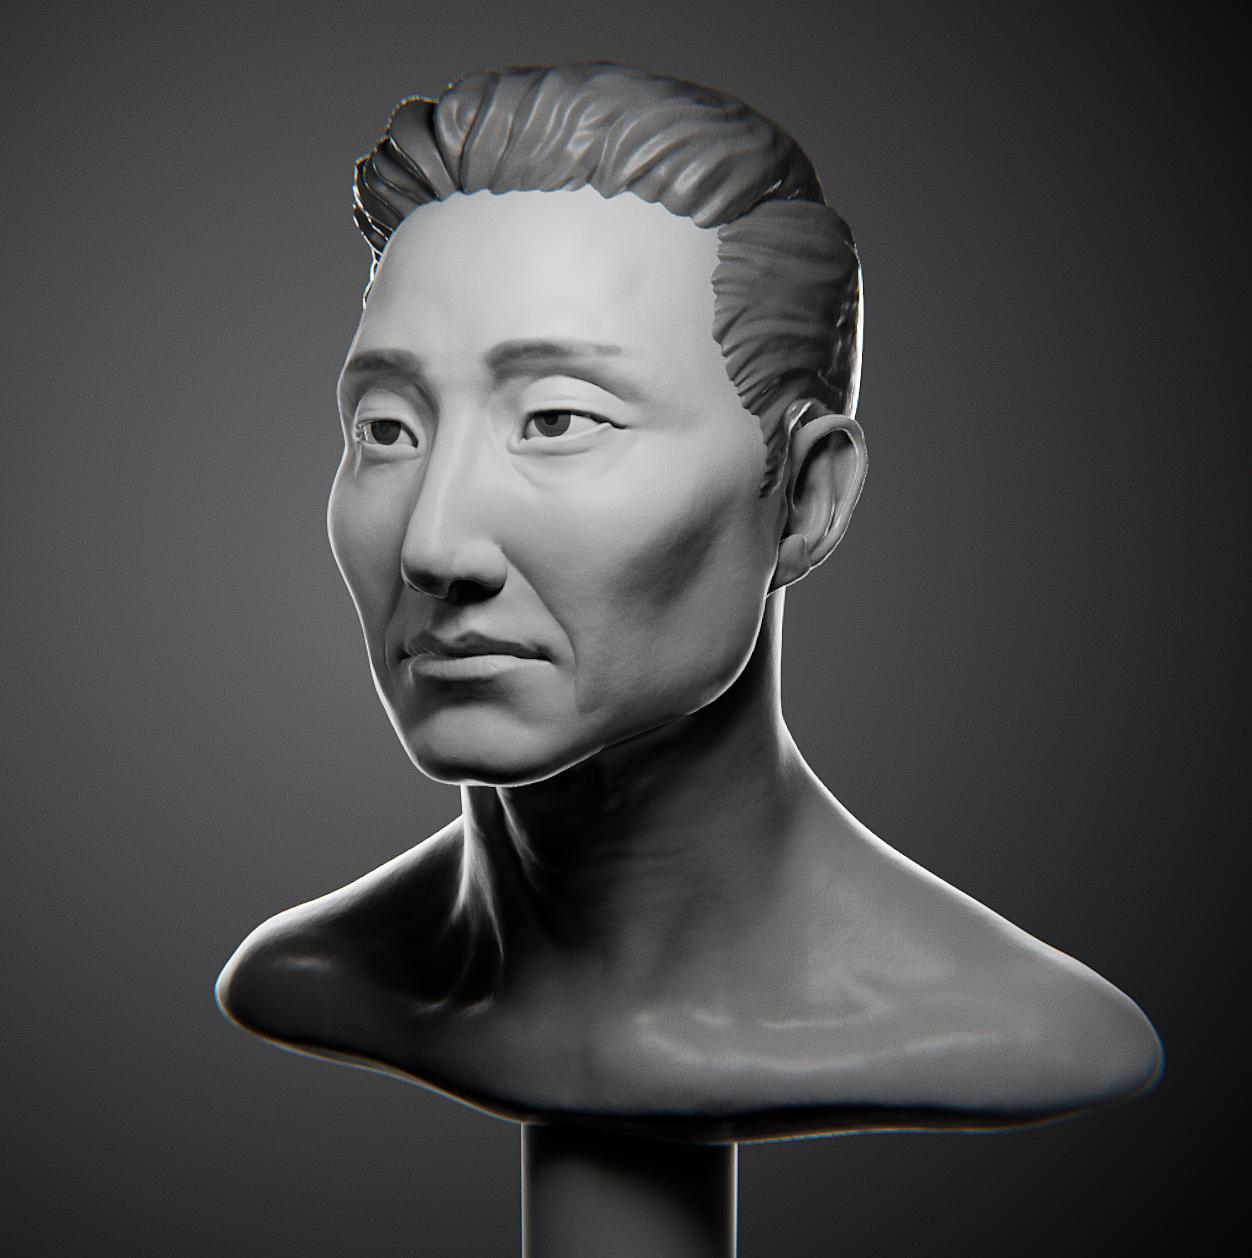 Likeness Portrait: Daniel Dae Kim